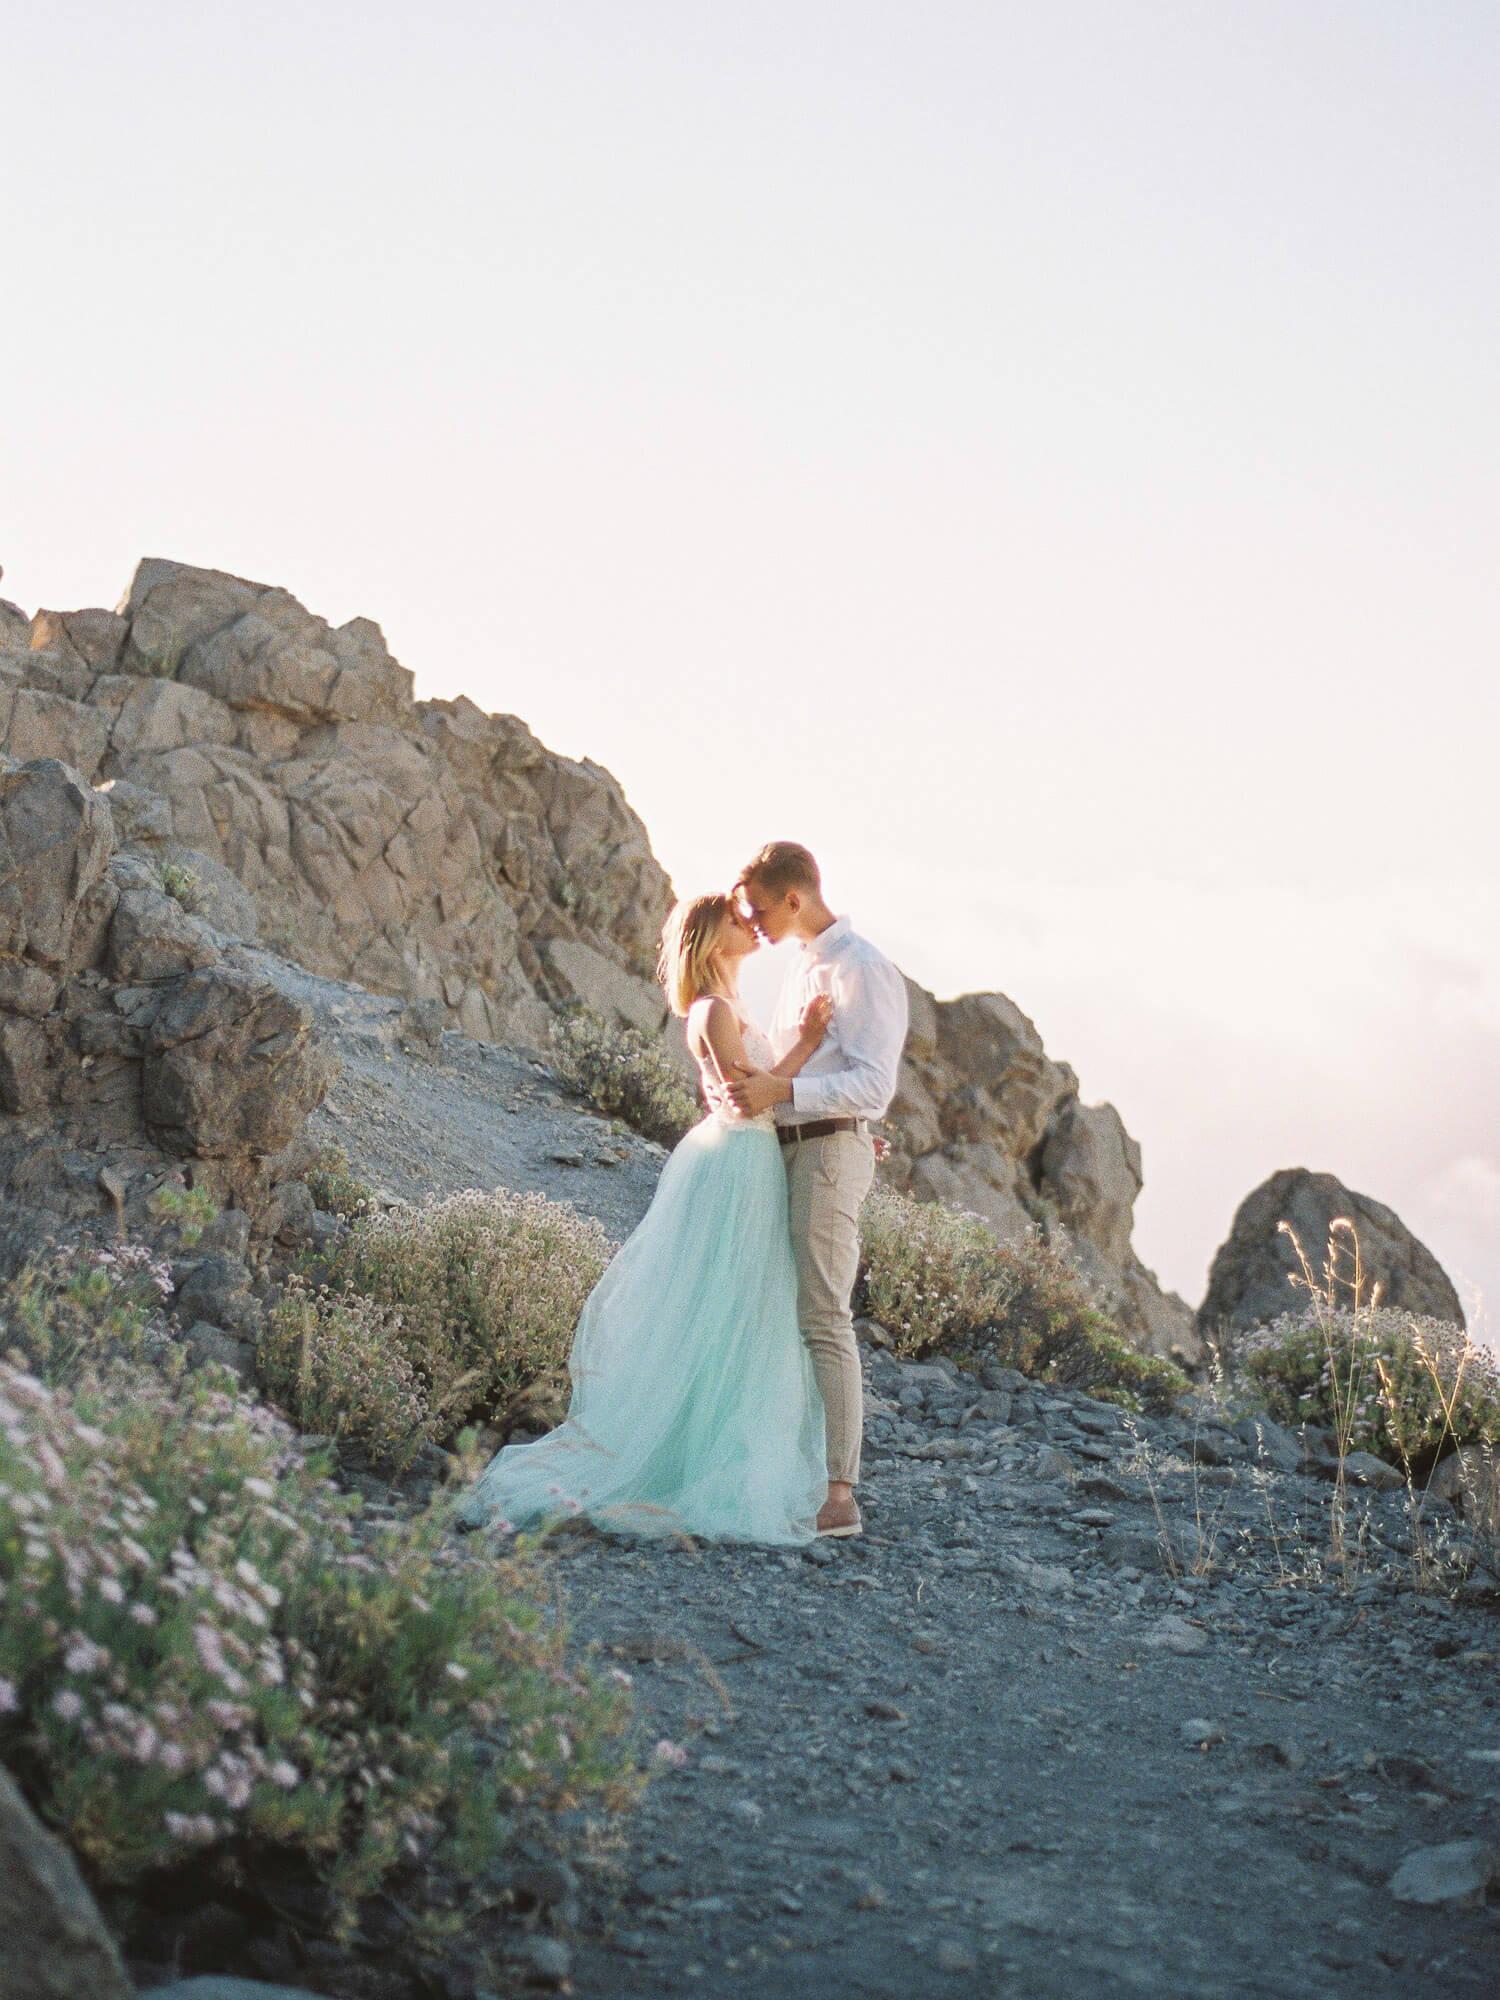 film wedding photography in Tenerife